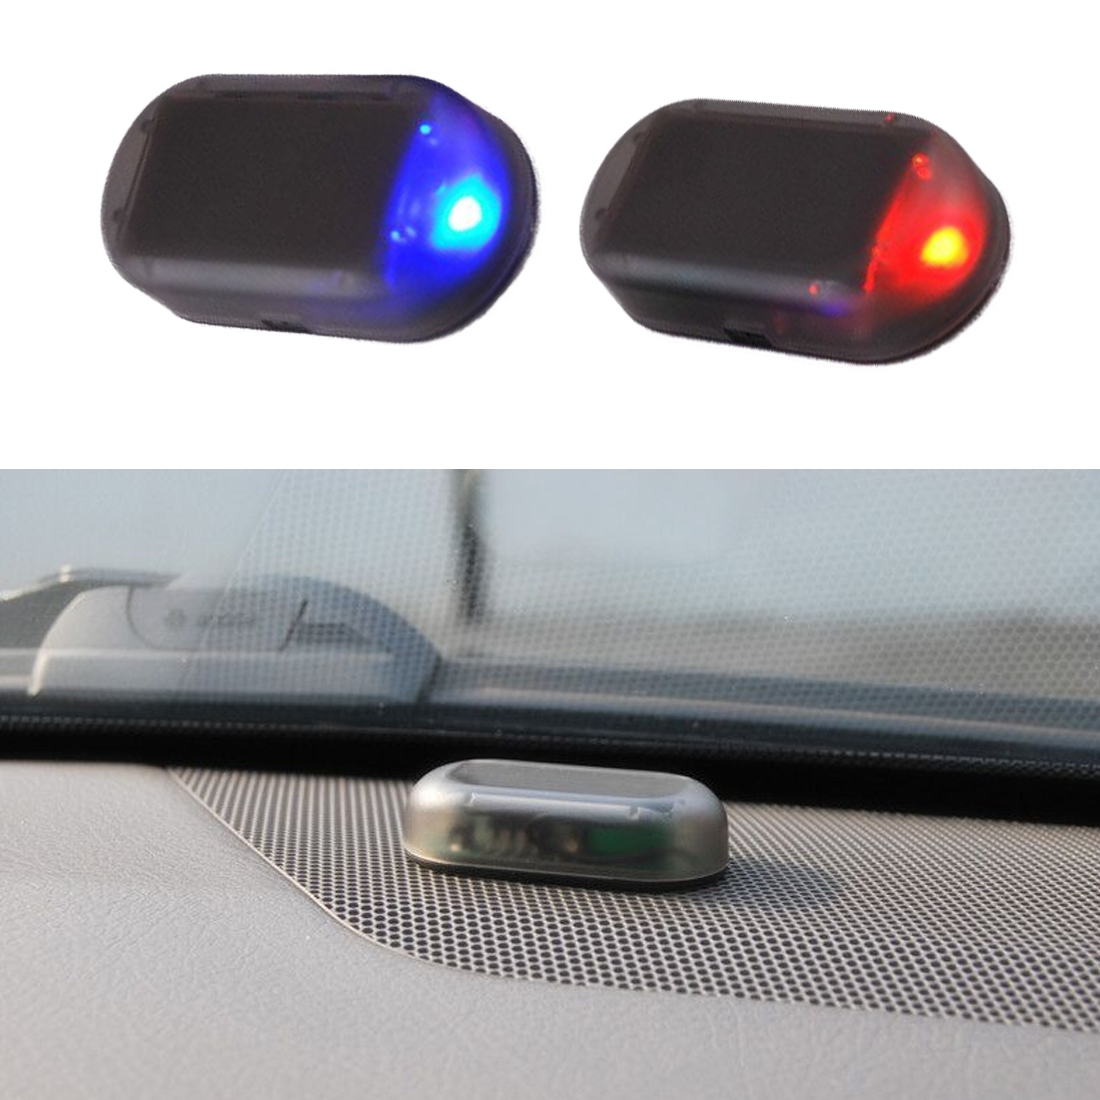 Tonewan Universal 1PCS Car Led Light Security System Warning Theft Flash Blinking Fake Solar Car Alarm LED Light